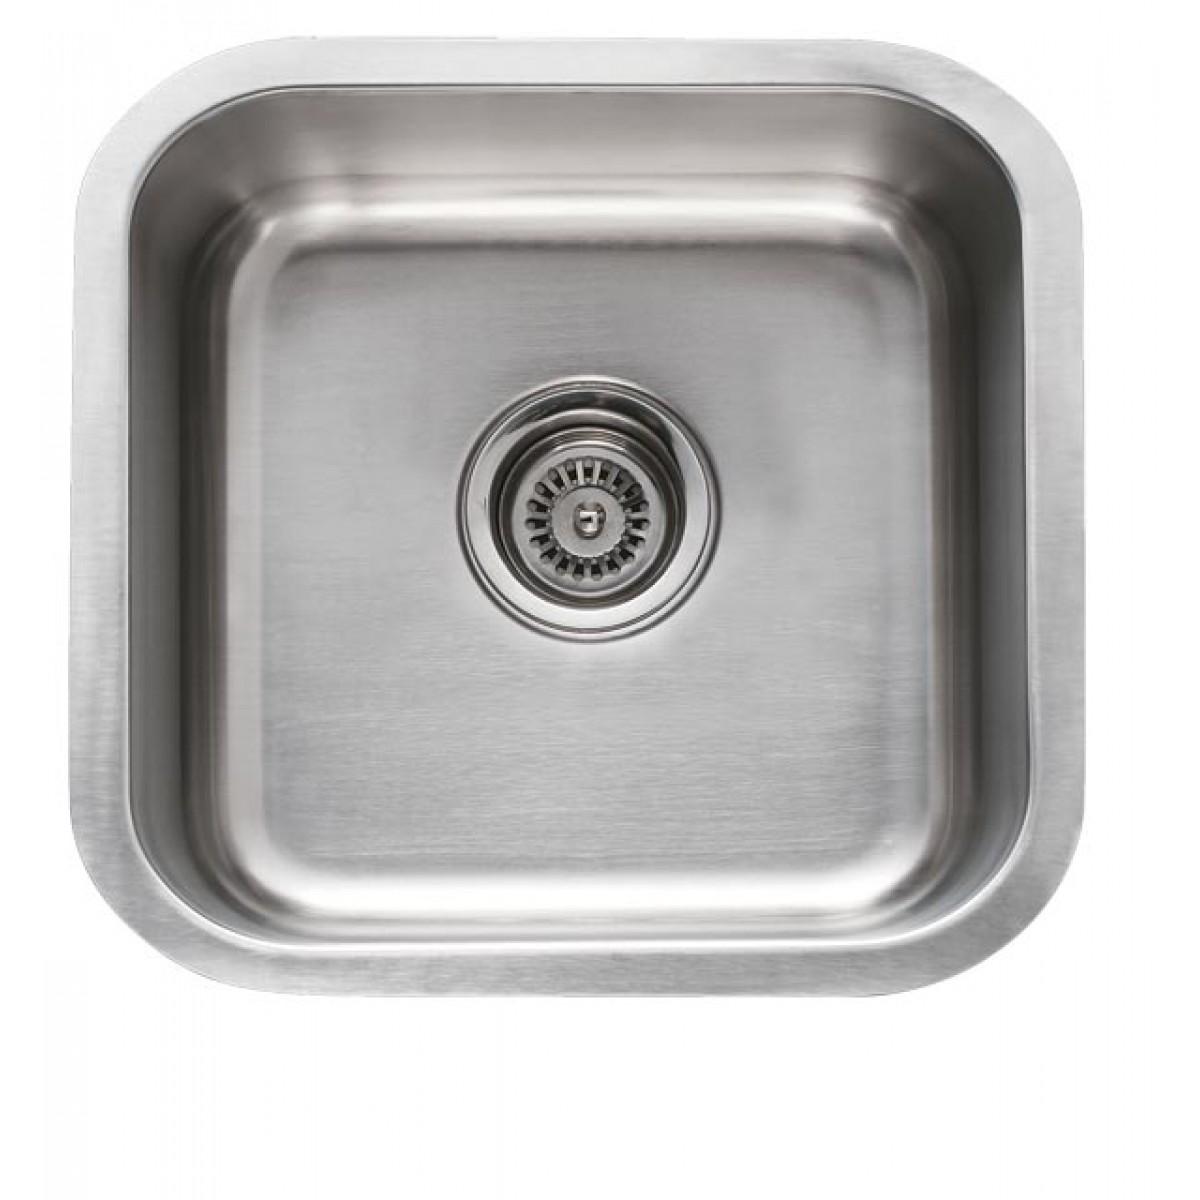 16 Inch Stainless Steel Undermount Single Bowl Kitchen / Bar / Prep Square  Sink   18 Gauge